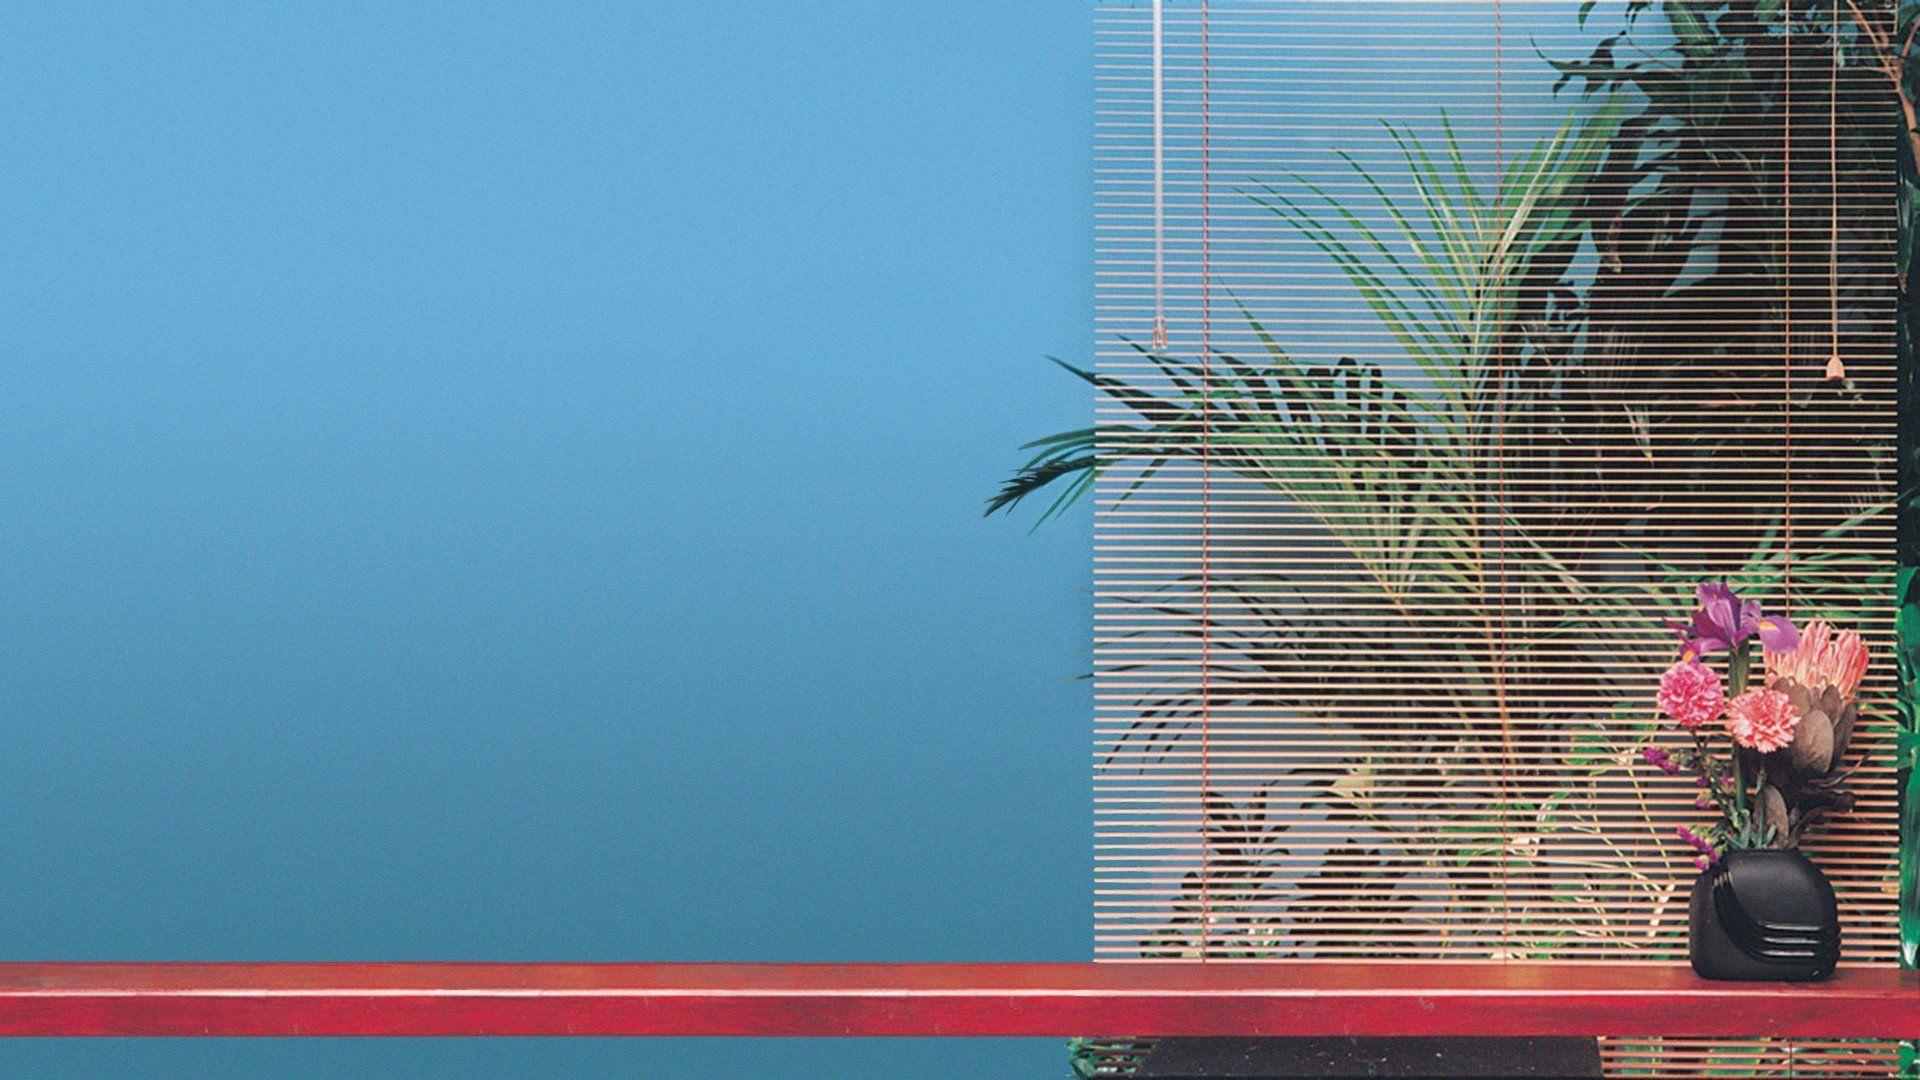 Aesthetic Wallpaper 1080p Aesthetic Wallpapers Vaporwave Wallpaper Laptop Wallpaper Desktop Wallpapers